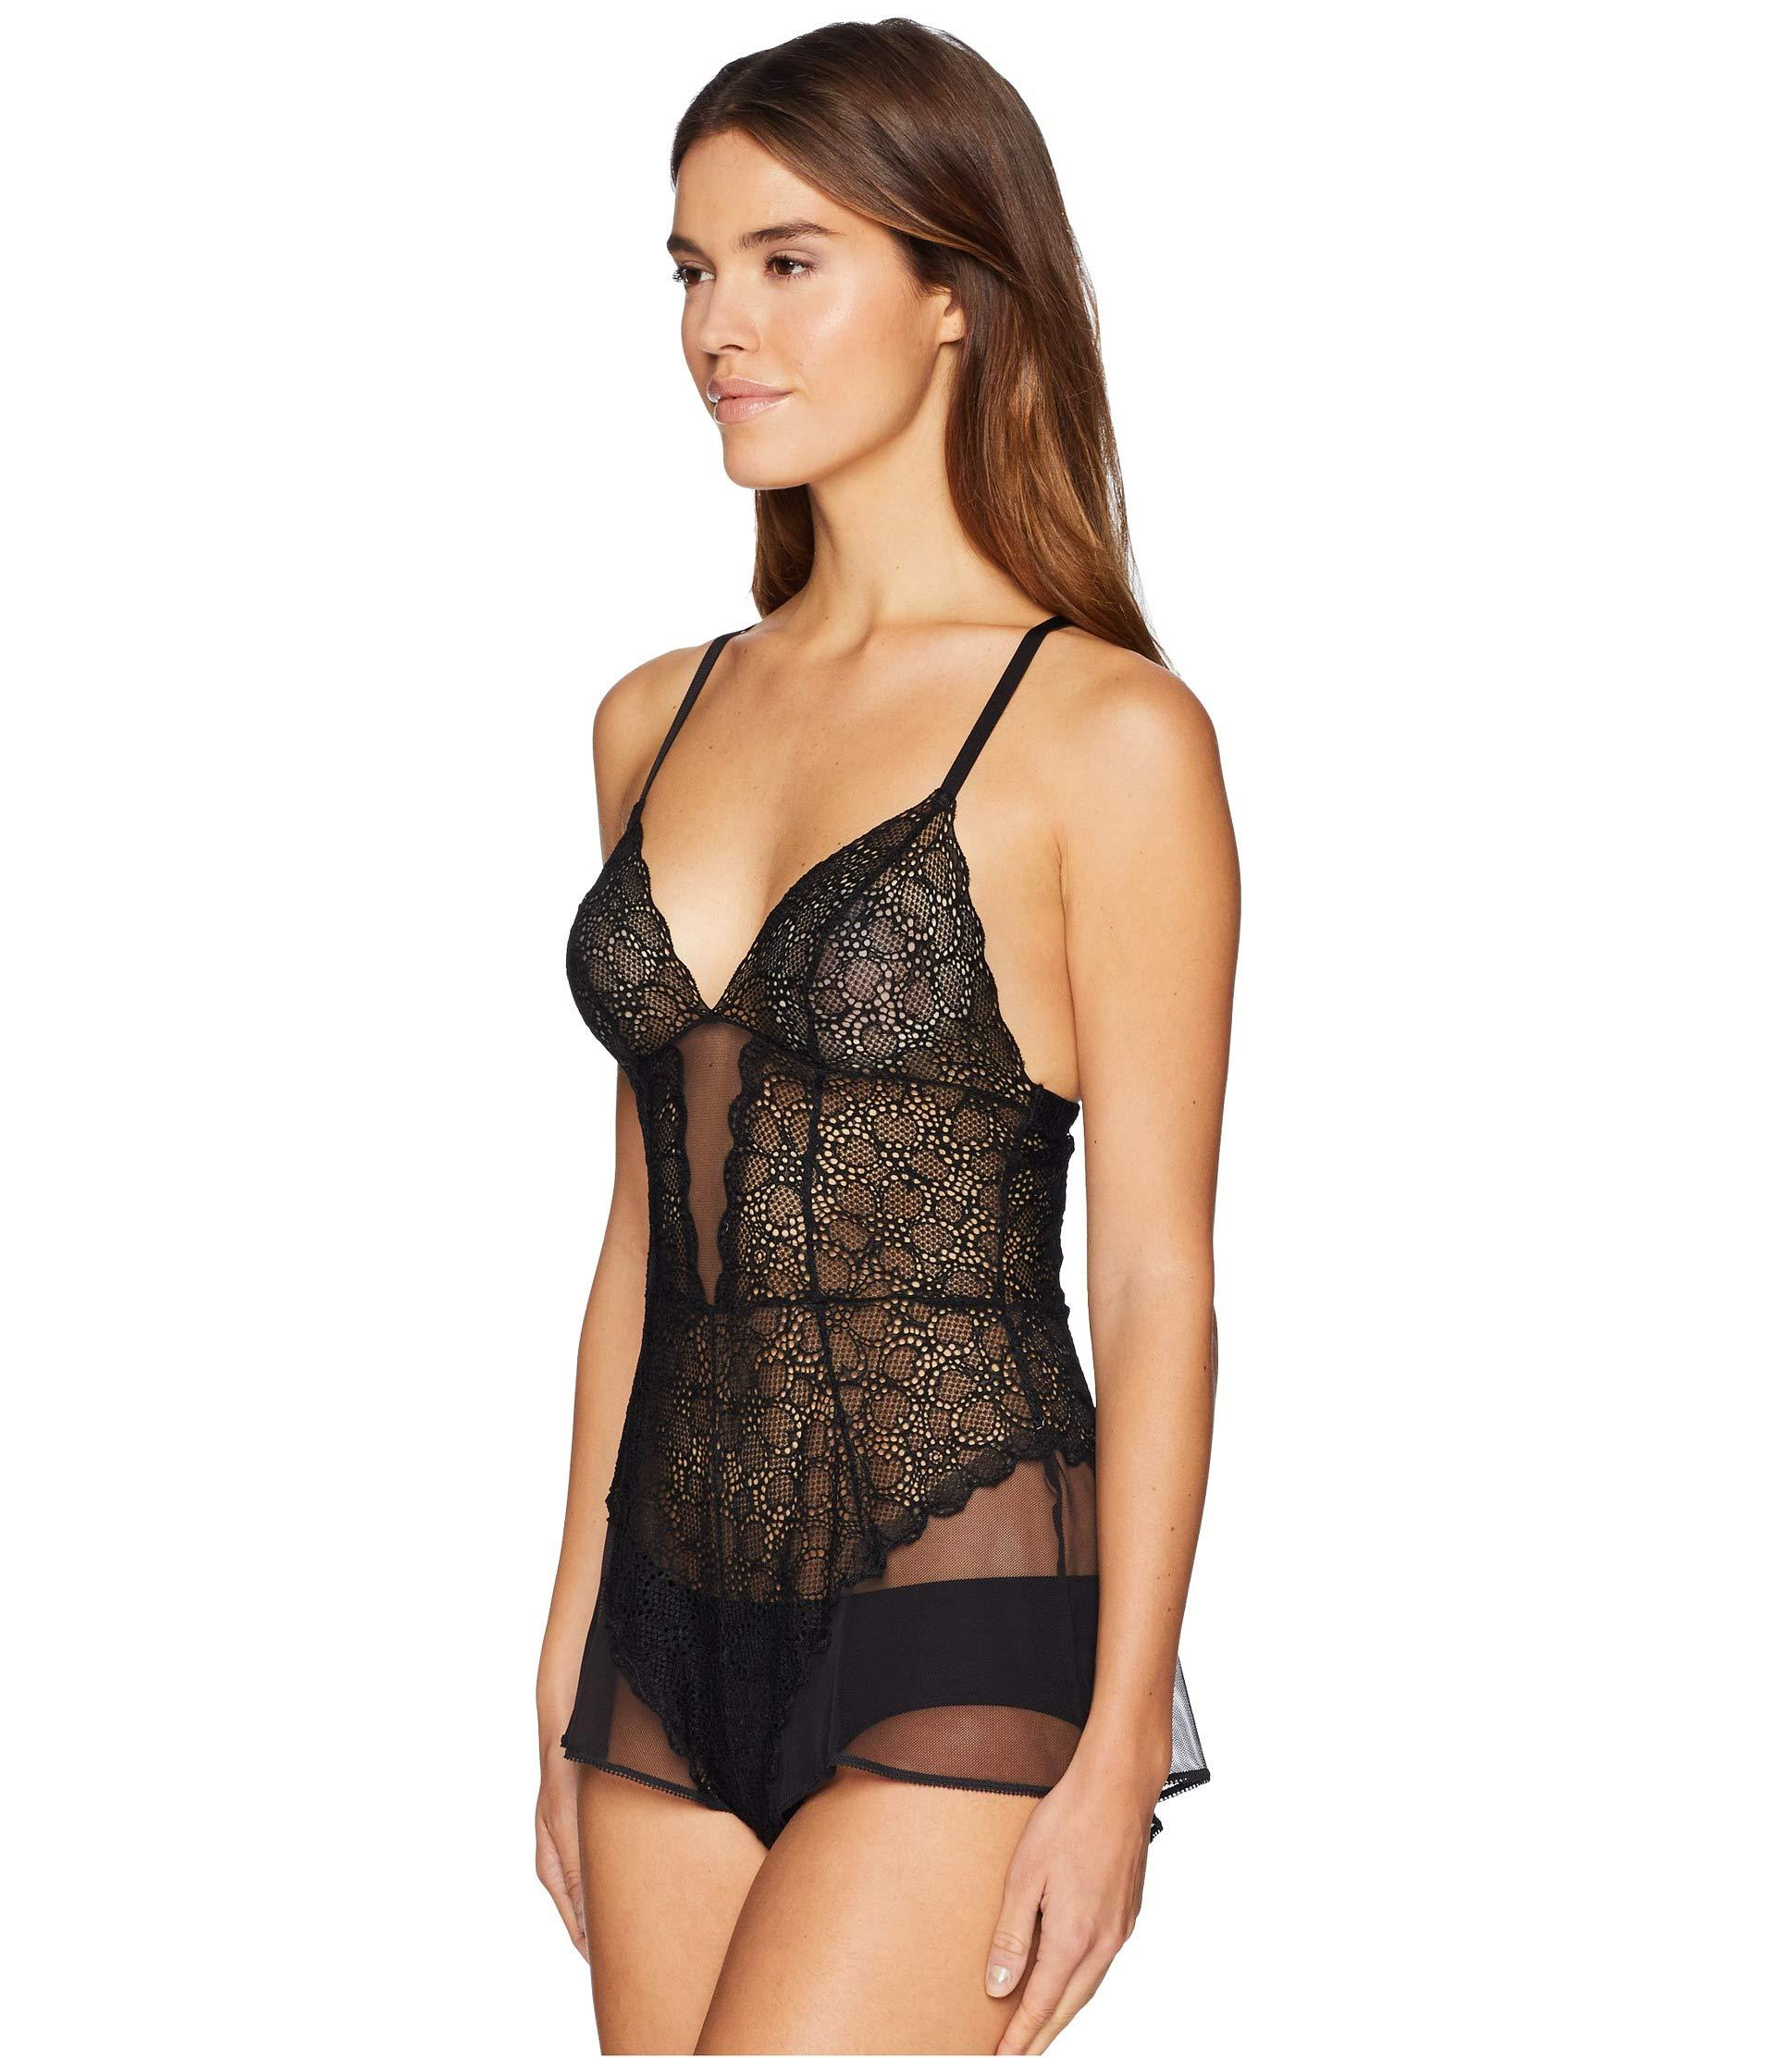 c58174f0f4b0 Lyst - DKNY Superior Lace Romper Teddy (whisky Rose) Women s ...